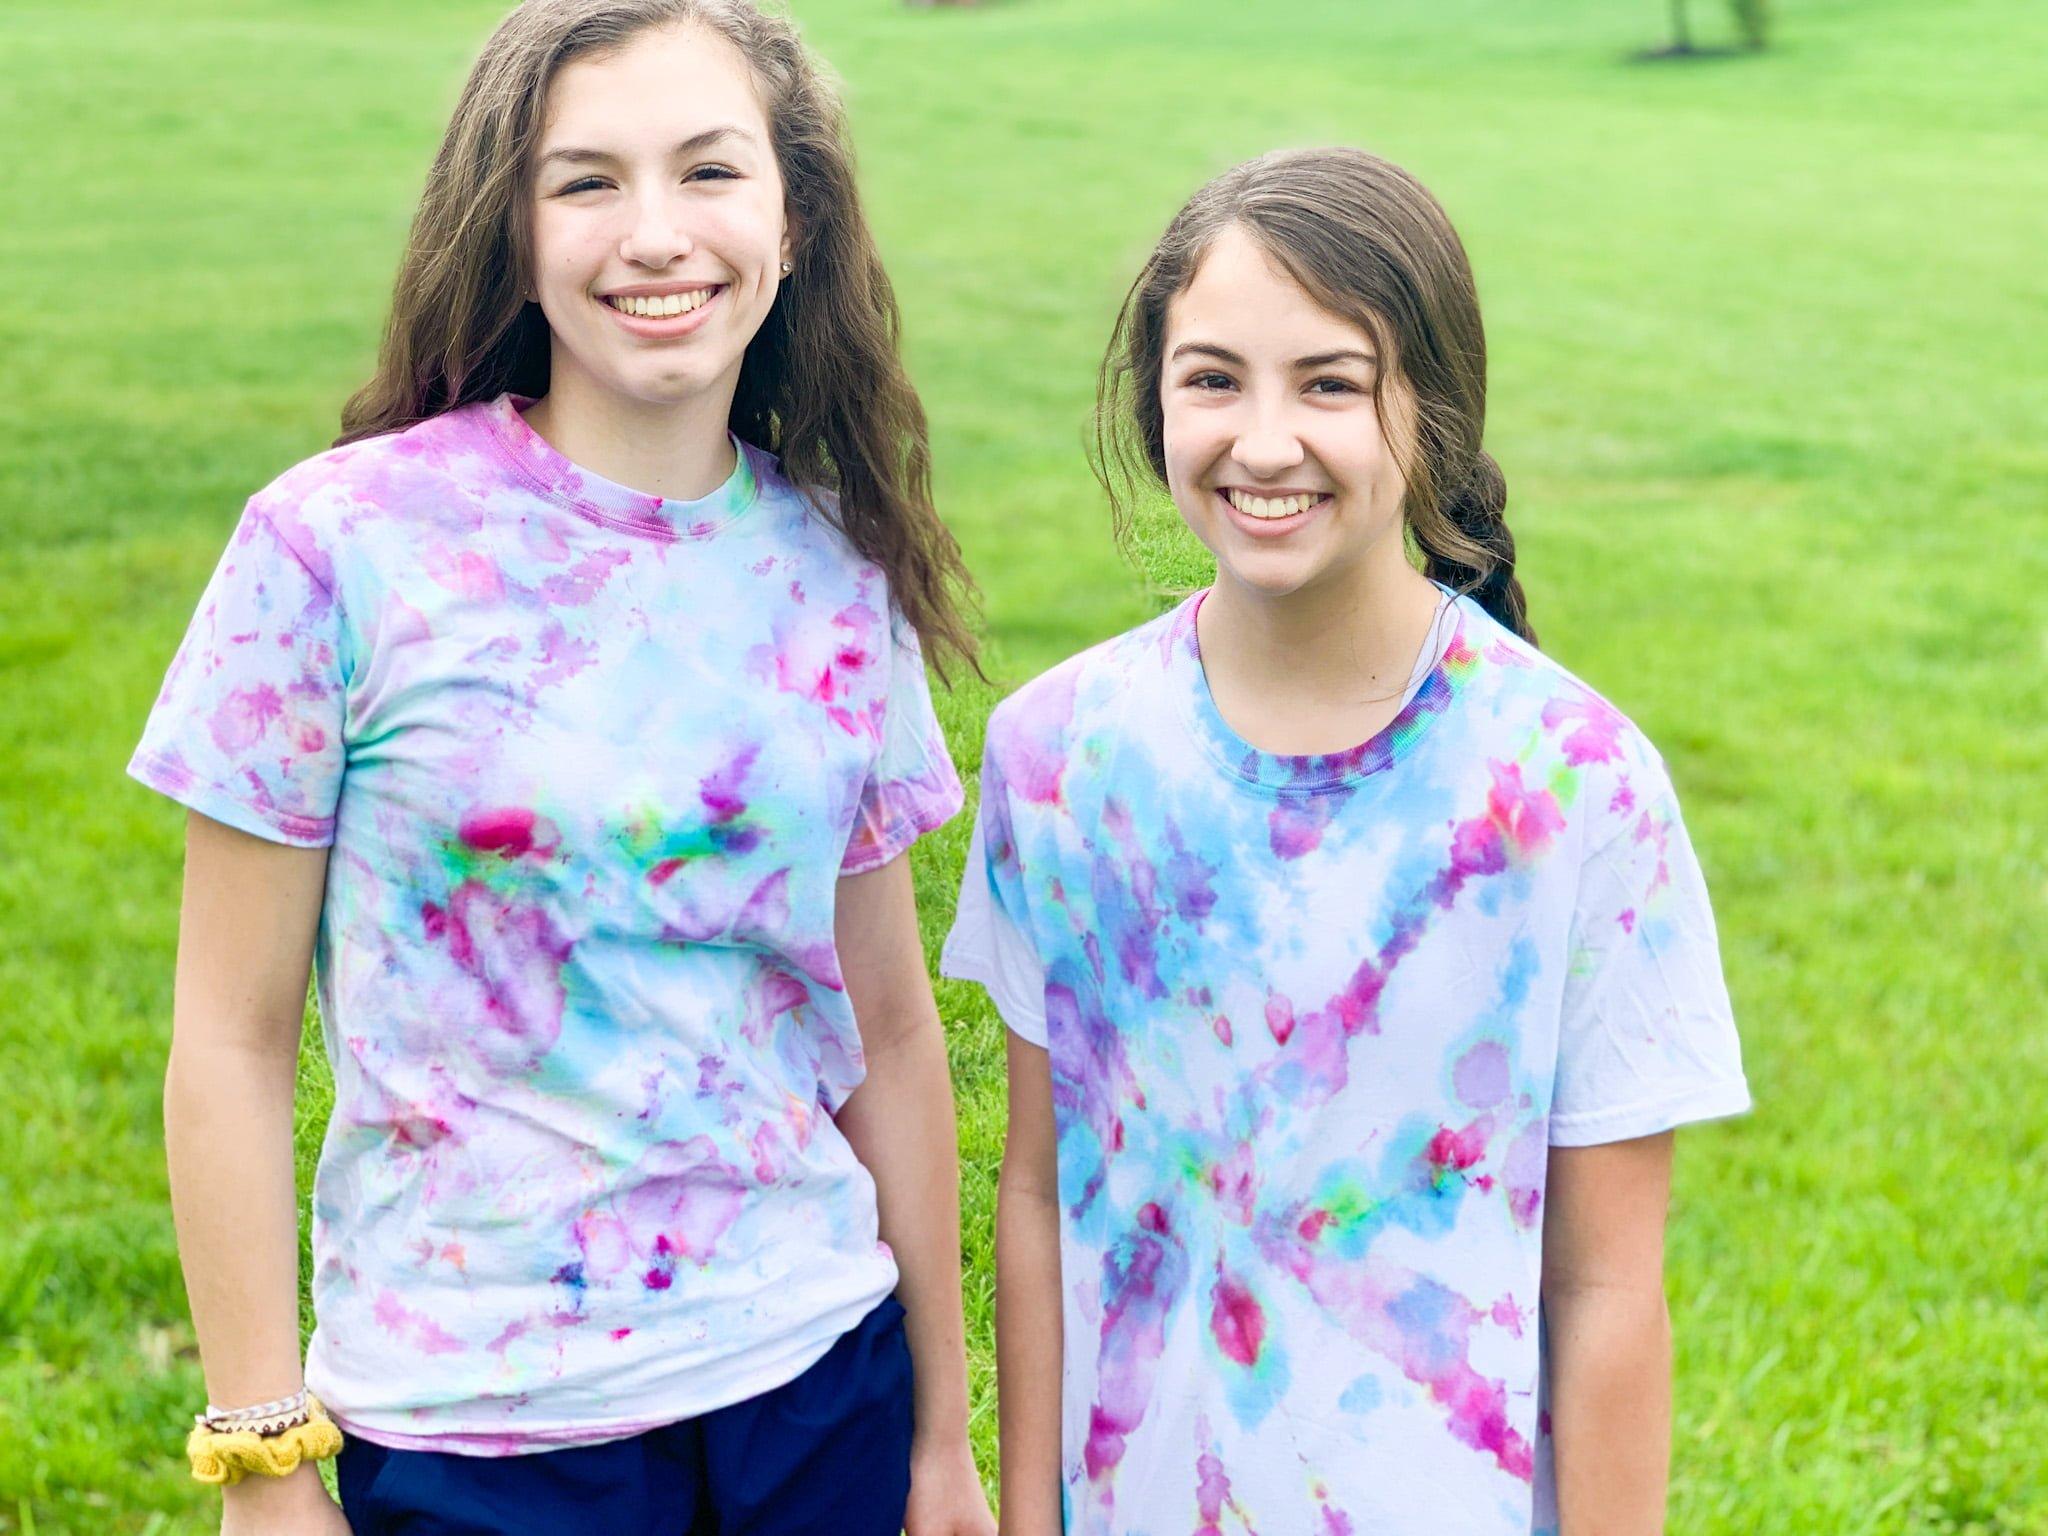 Ice Tie Dye Shirts